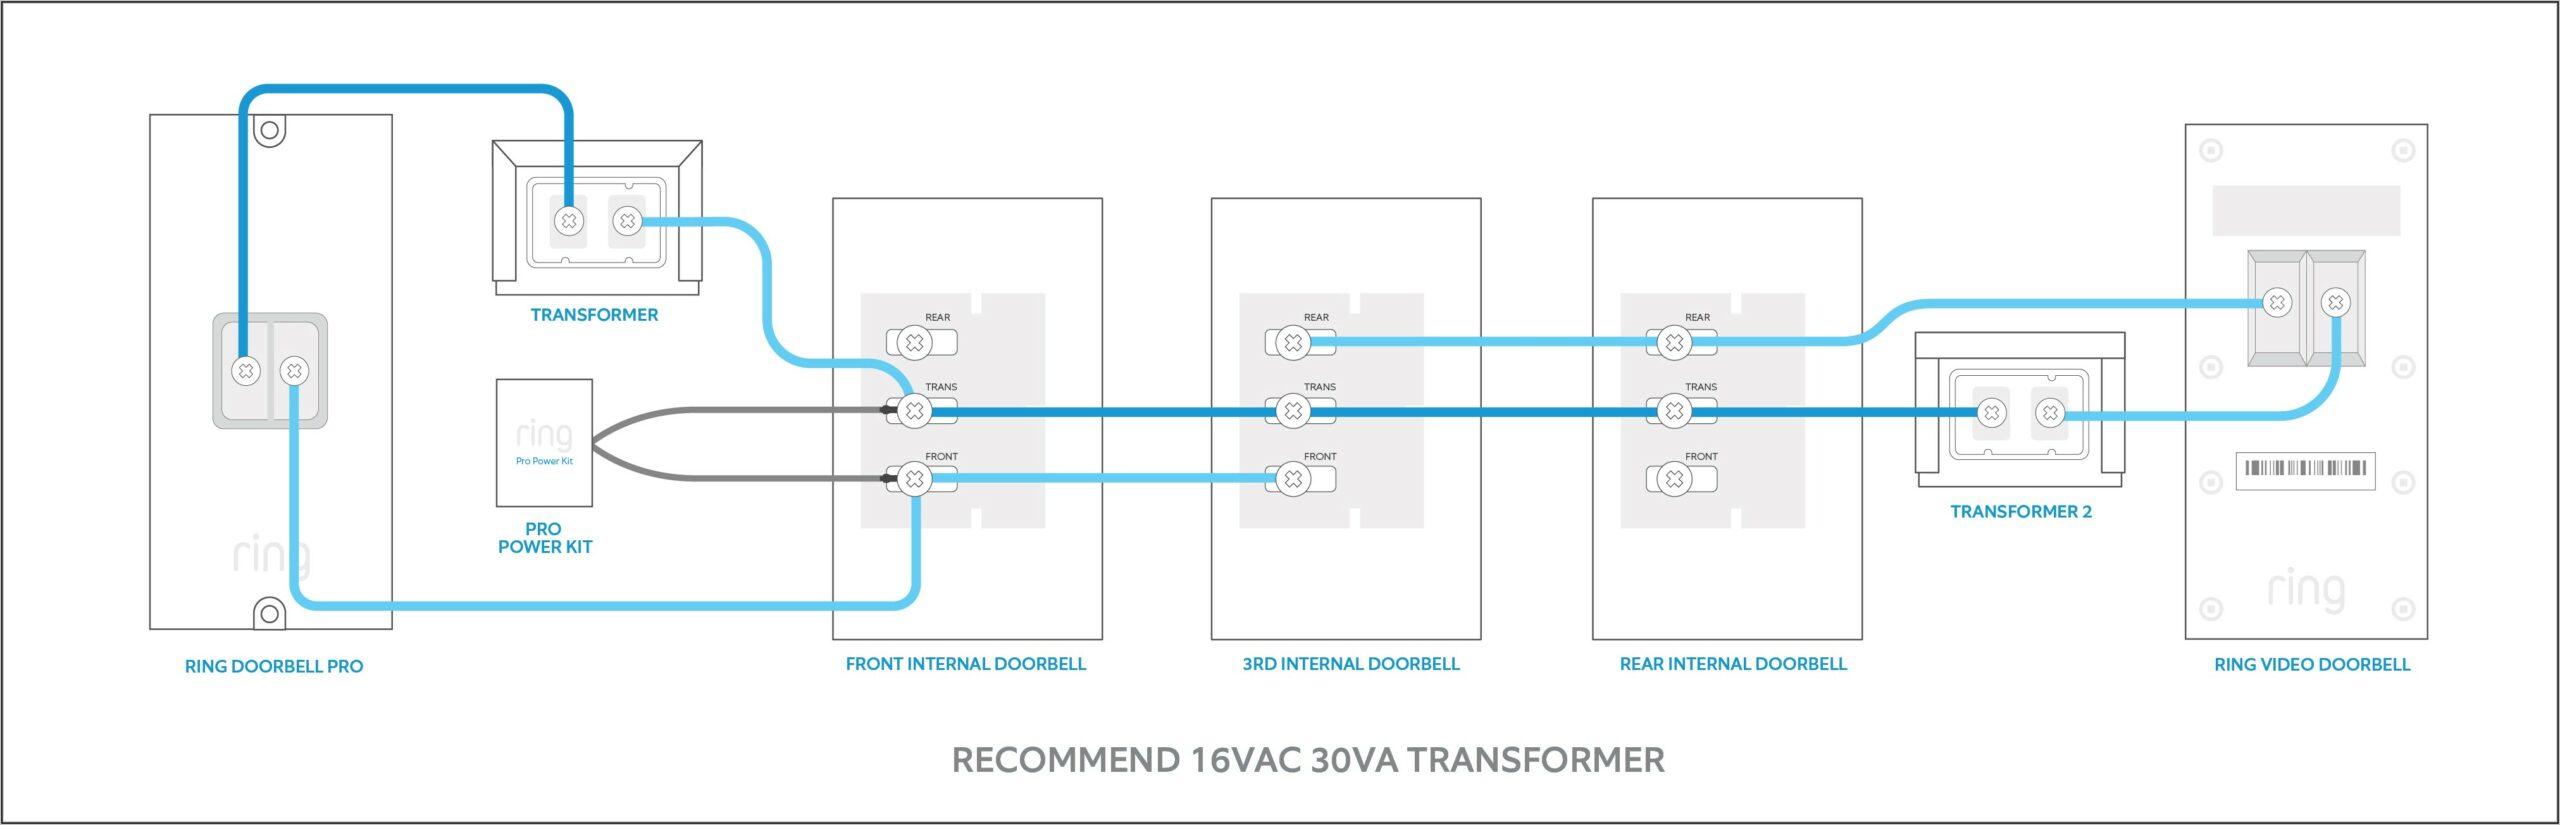 Ring Doorbell Transformer Uk Wiring Diagram